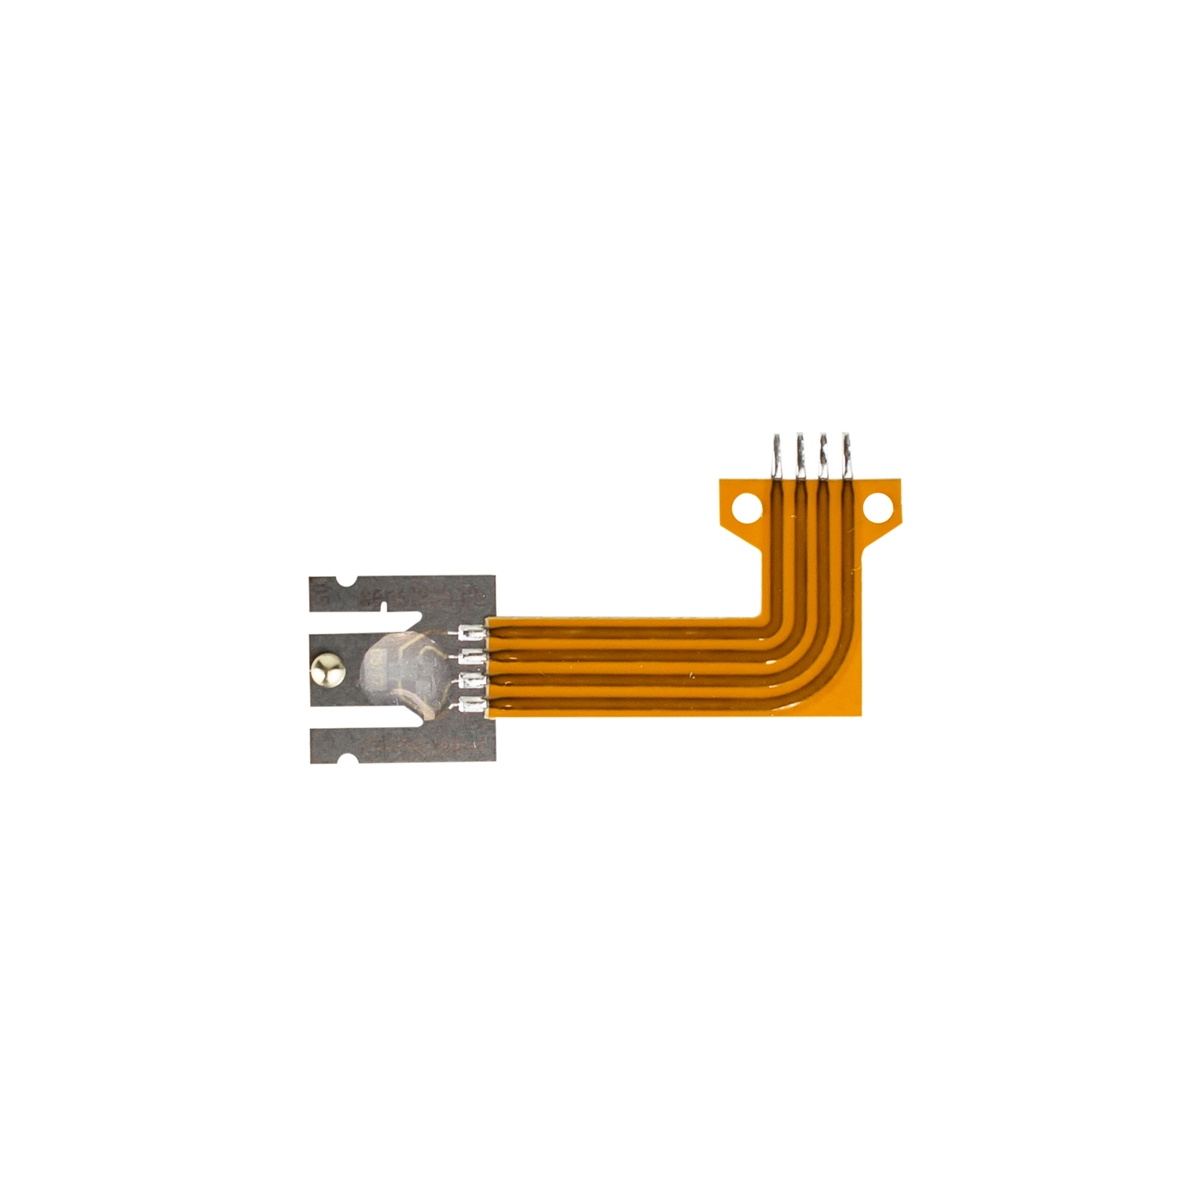 Philips Avalon M2734A M2735A TOCO Smart Transducer Gauge